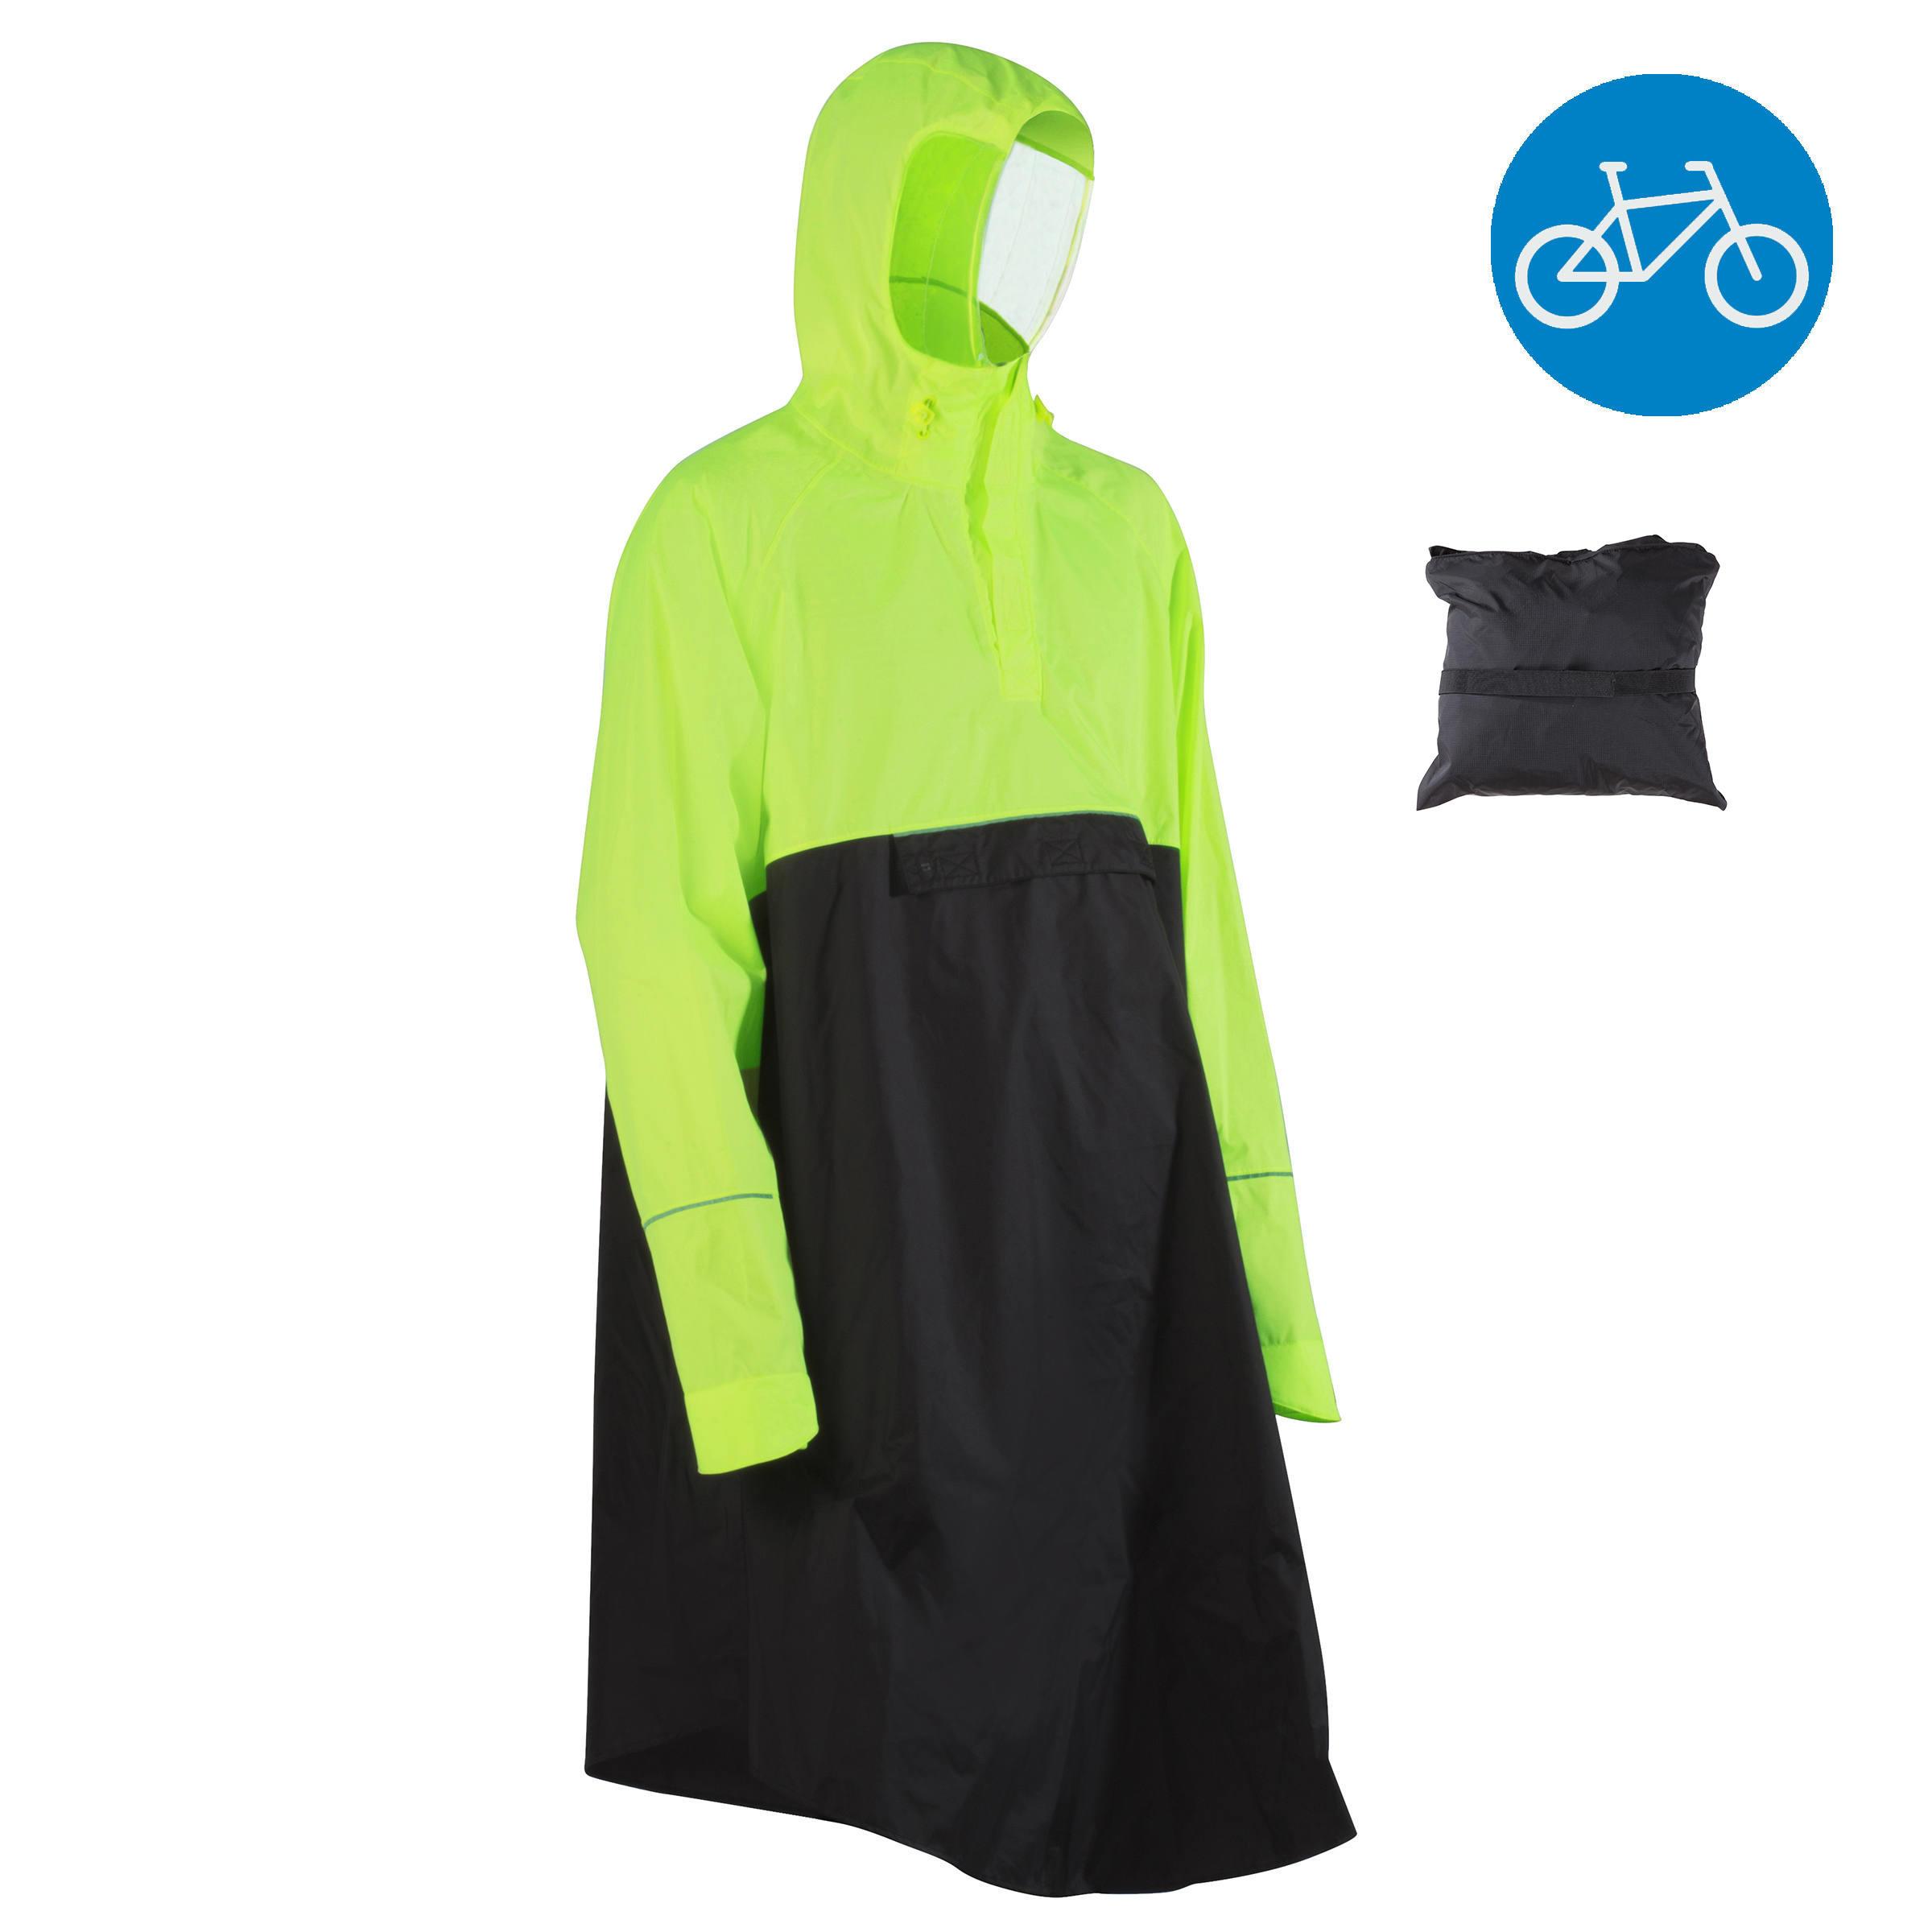 900 Cycling Rain Poncho - Neon Yellow / Black